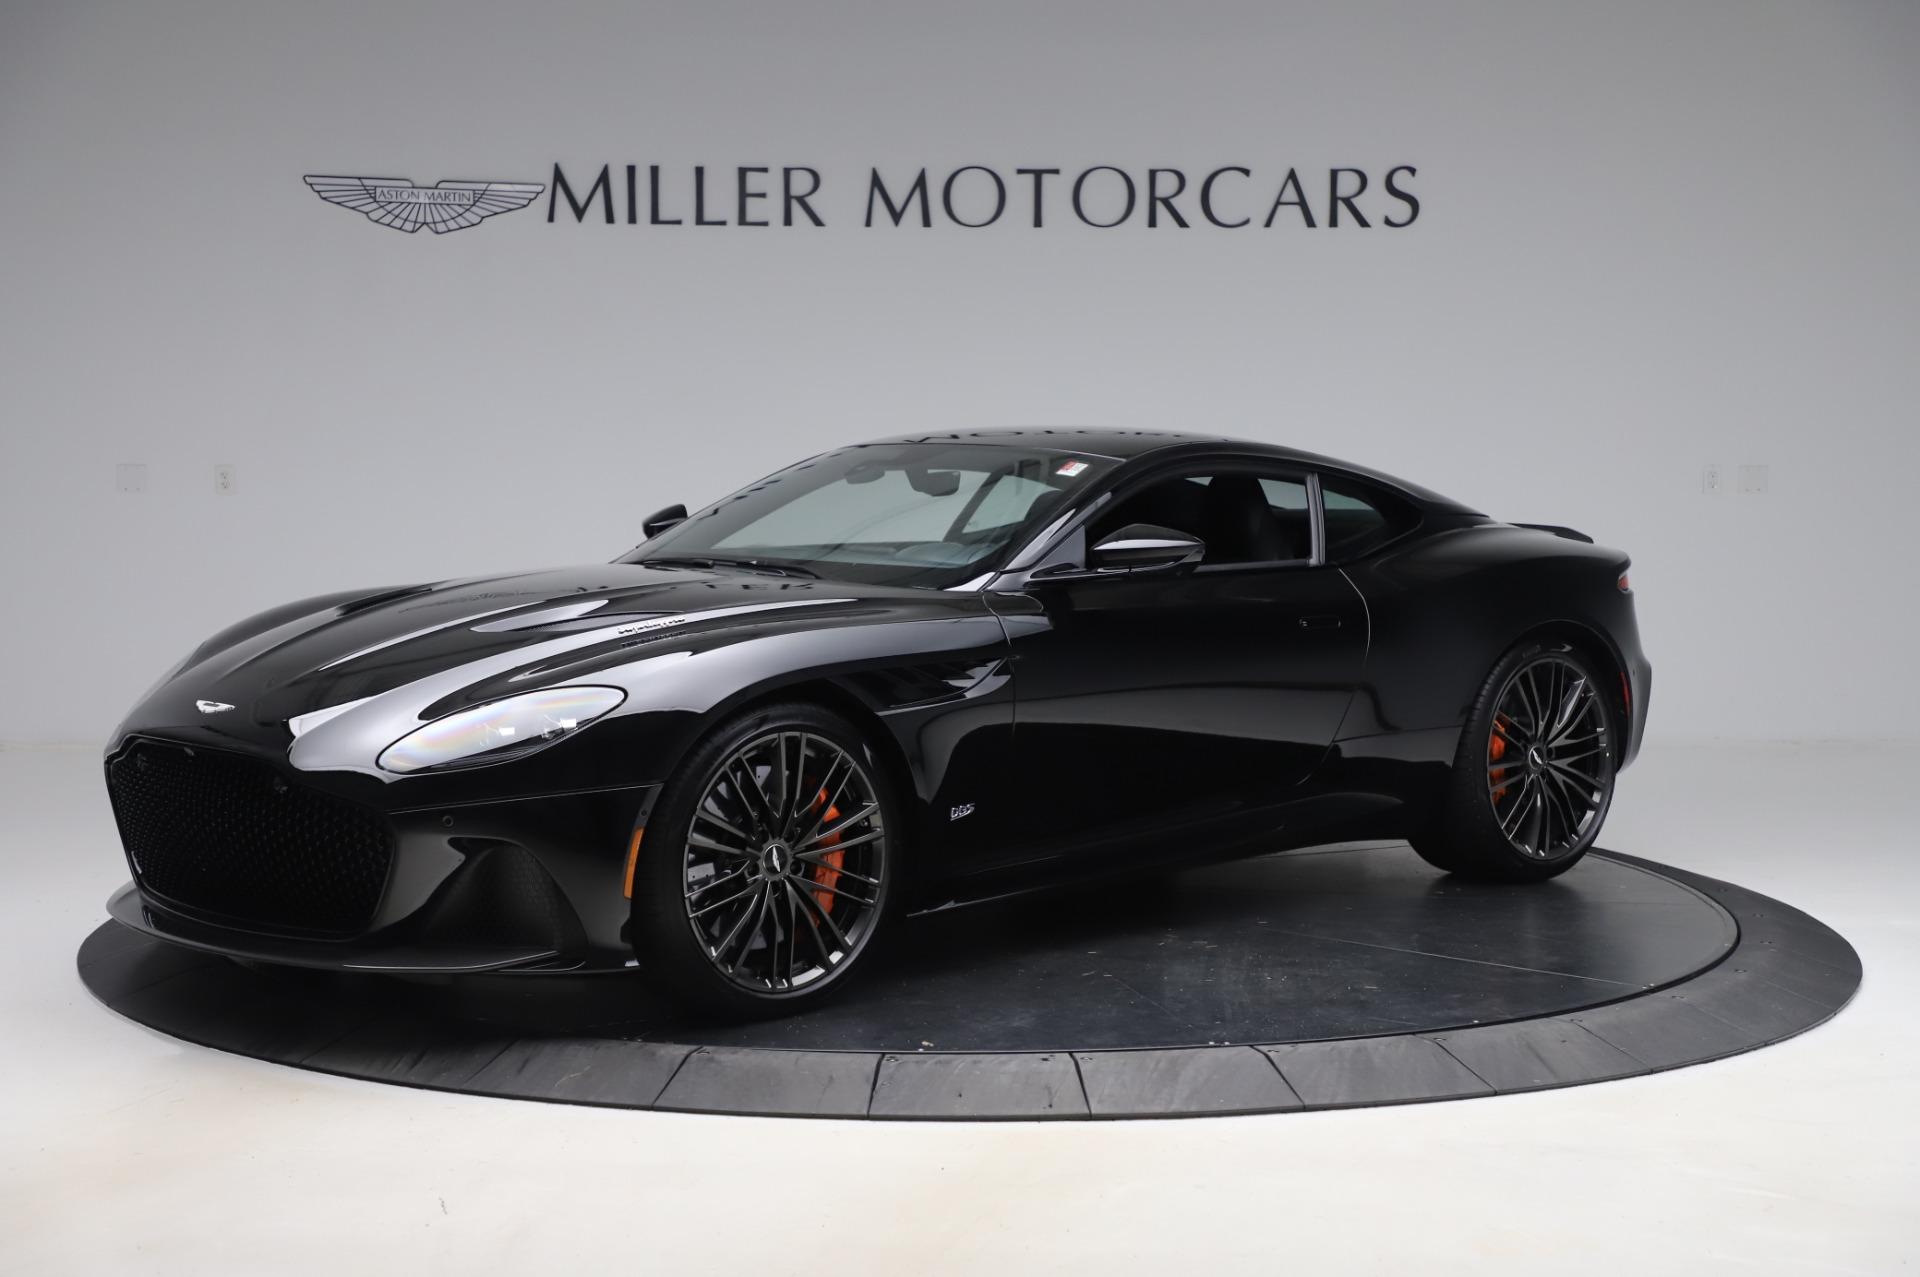 New 2020 Aston Martin DBS Superleggera for sale $328,786 at Pagani of Greenwich in Greenwich CT 06830 1